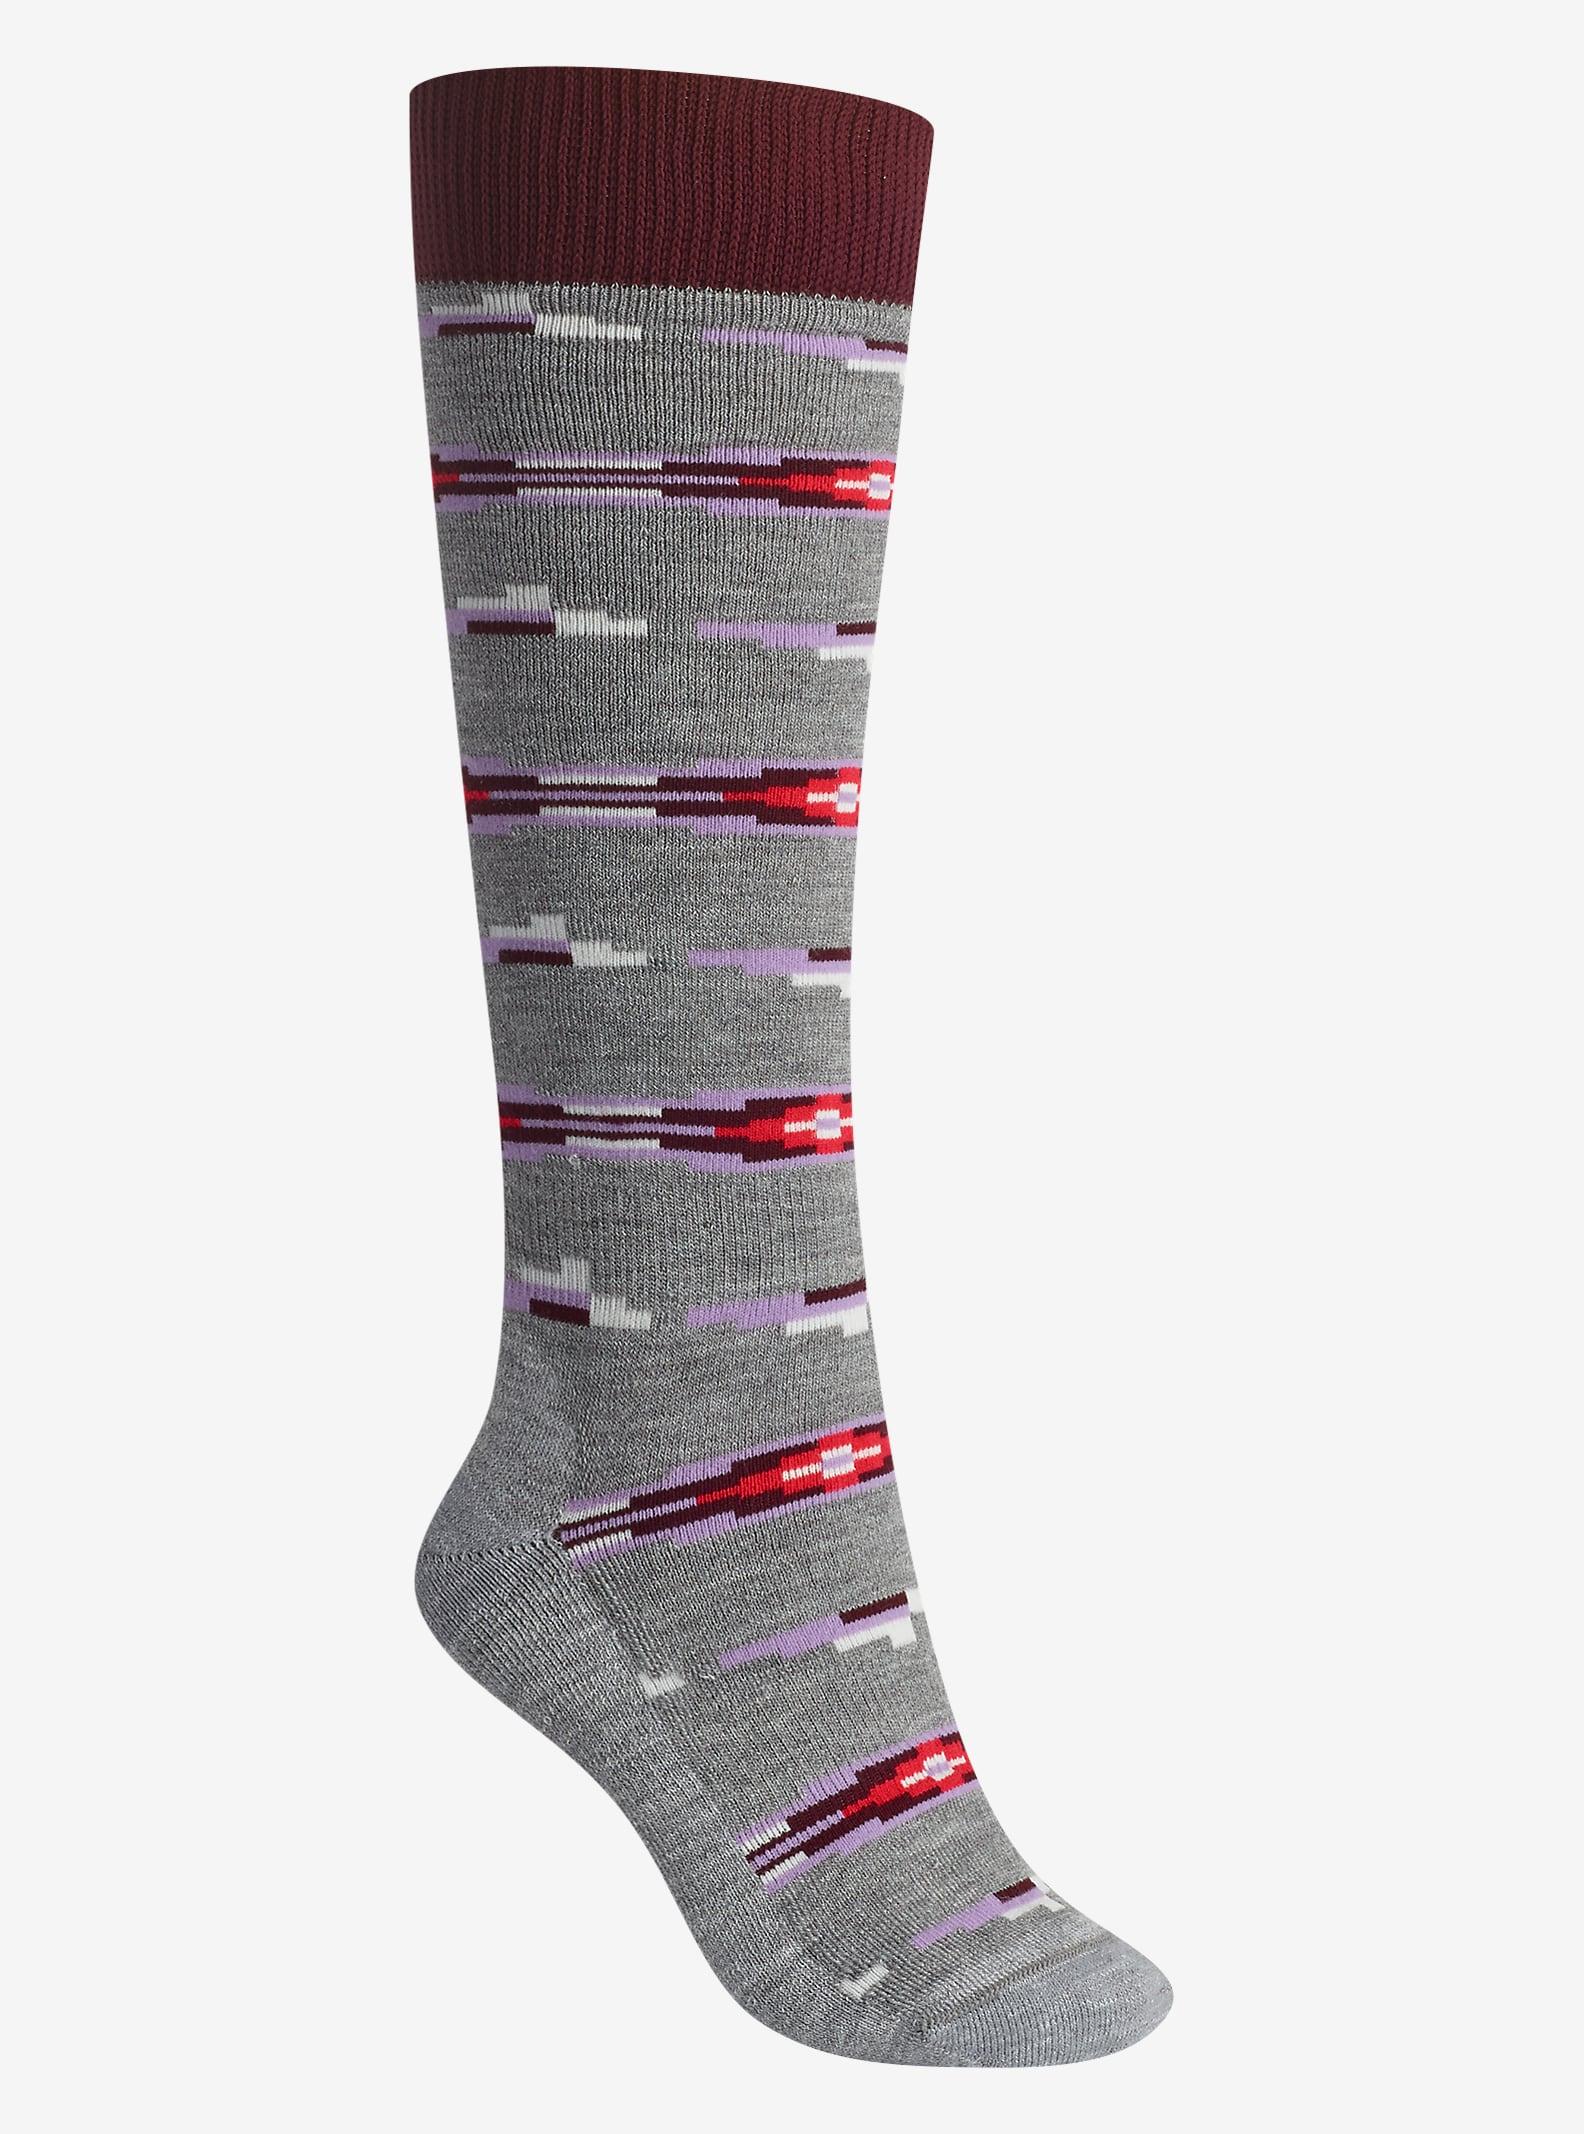 Burton Shadow Sock shown in Heather Iron Gray